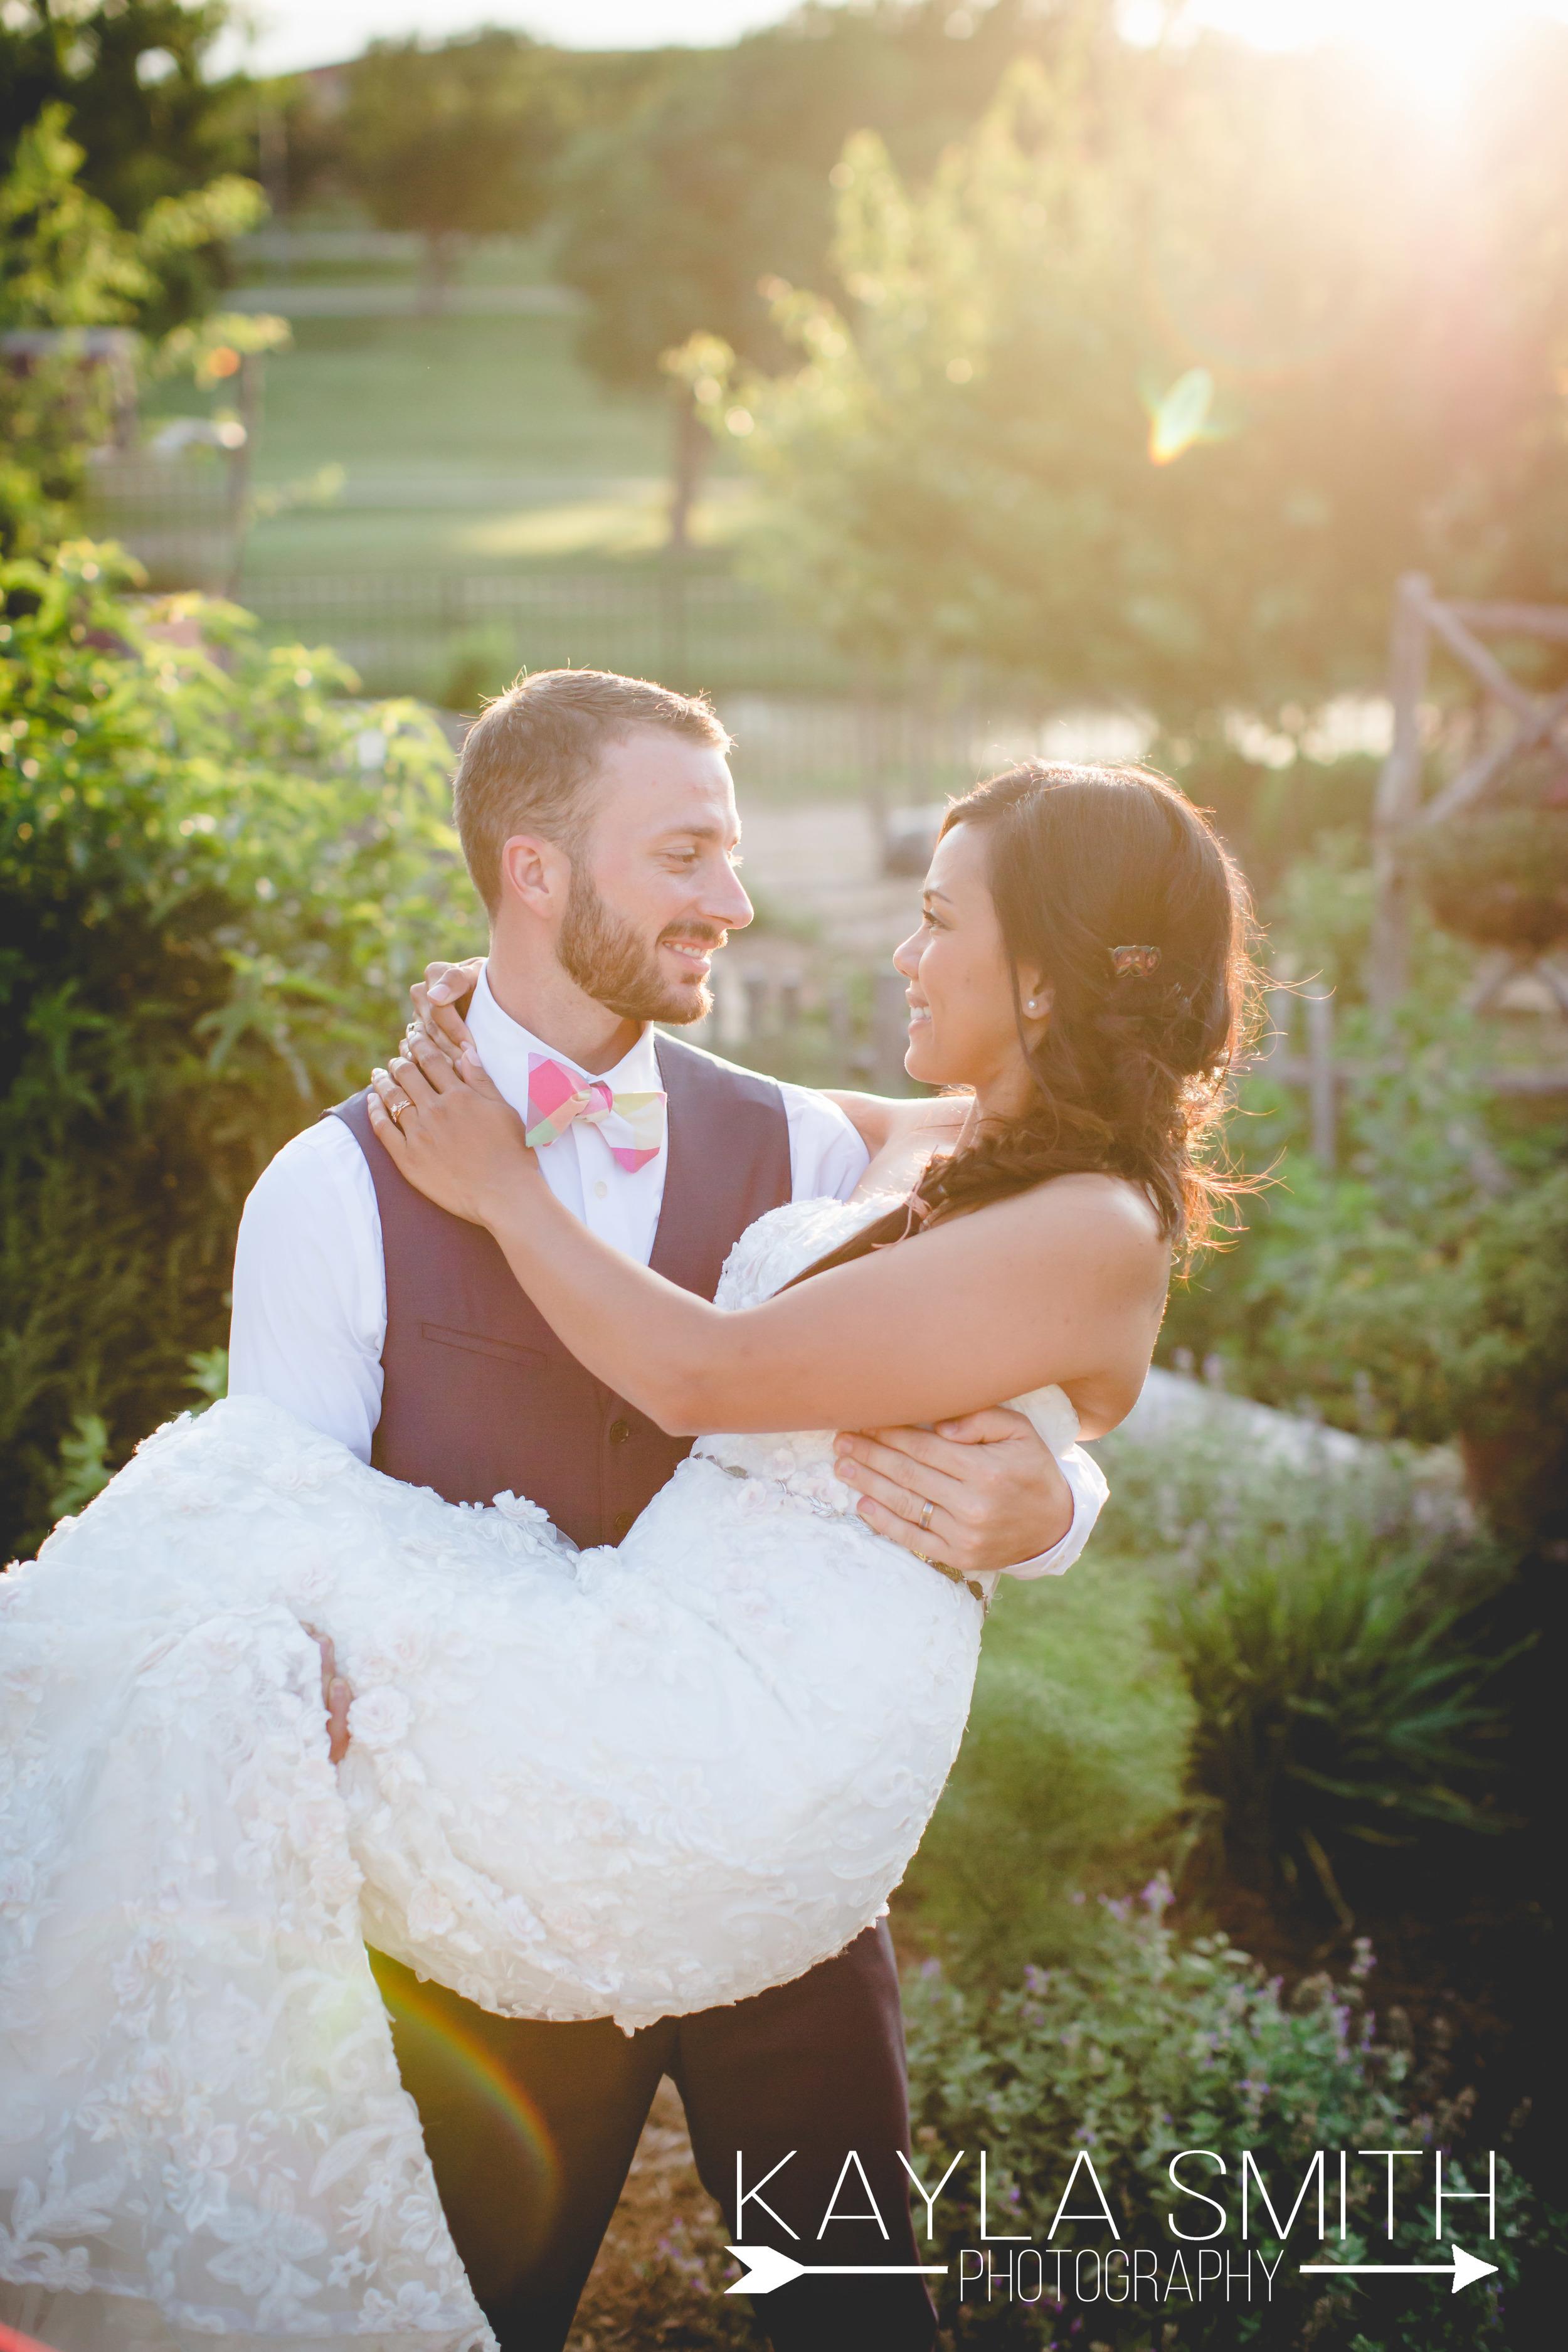 An Amarillo Botanical Garden wedding in the Golden Hour. Perfection.